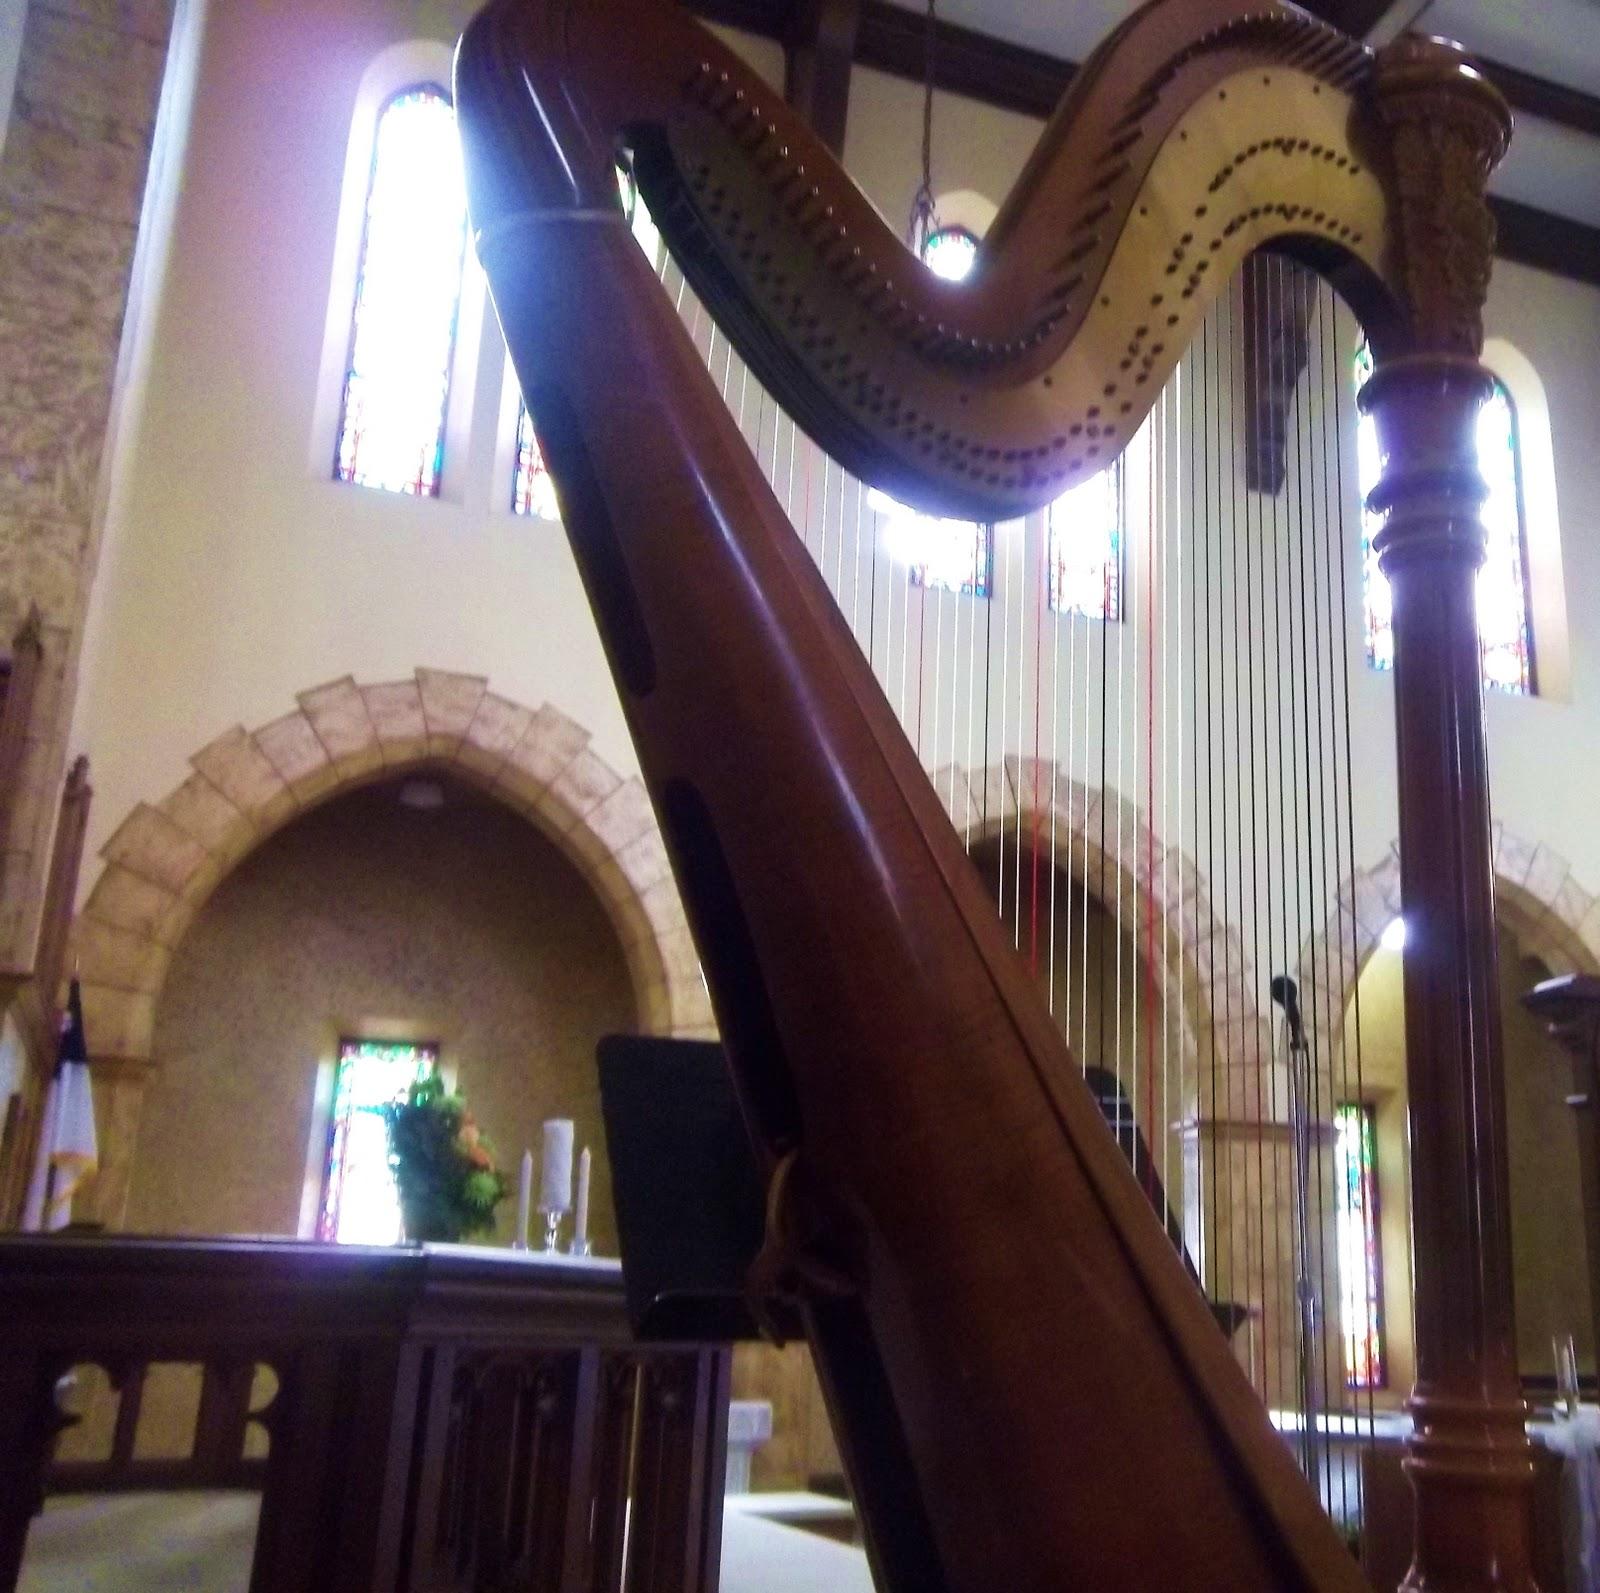 http://3.bp.blogspot.com/-E7WhQJb7BUw/Ttj-giUhaVI/AAAAAAAABKA/diaMNDchG8I/s1600/Ohio_Memorial_Chapel_Tiffin_Wedding_Harpist.JPG